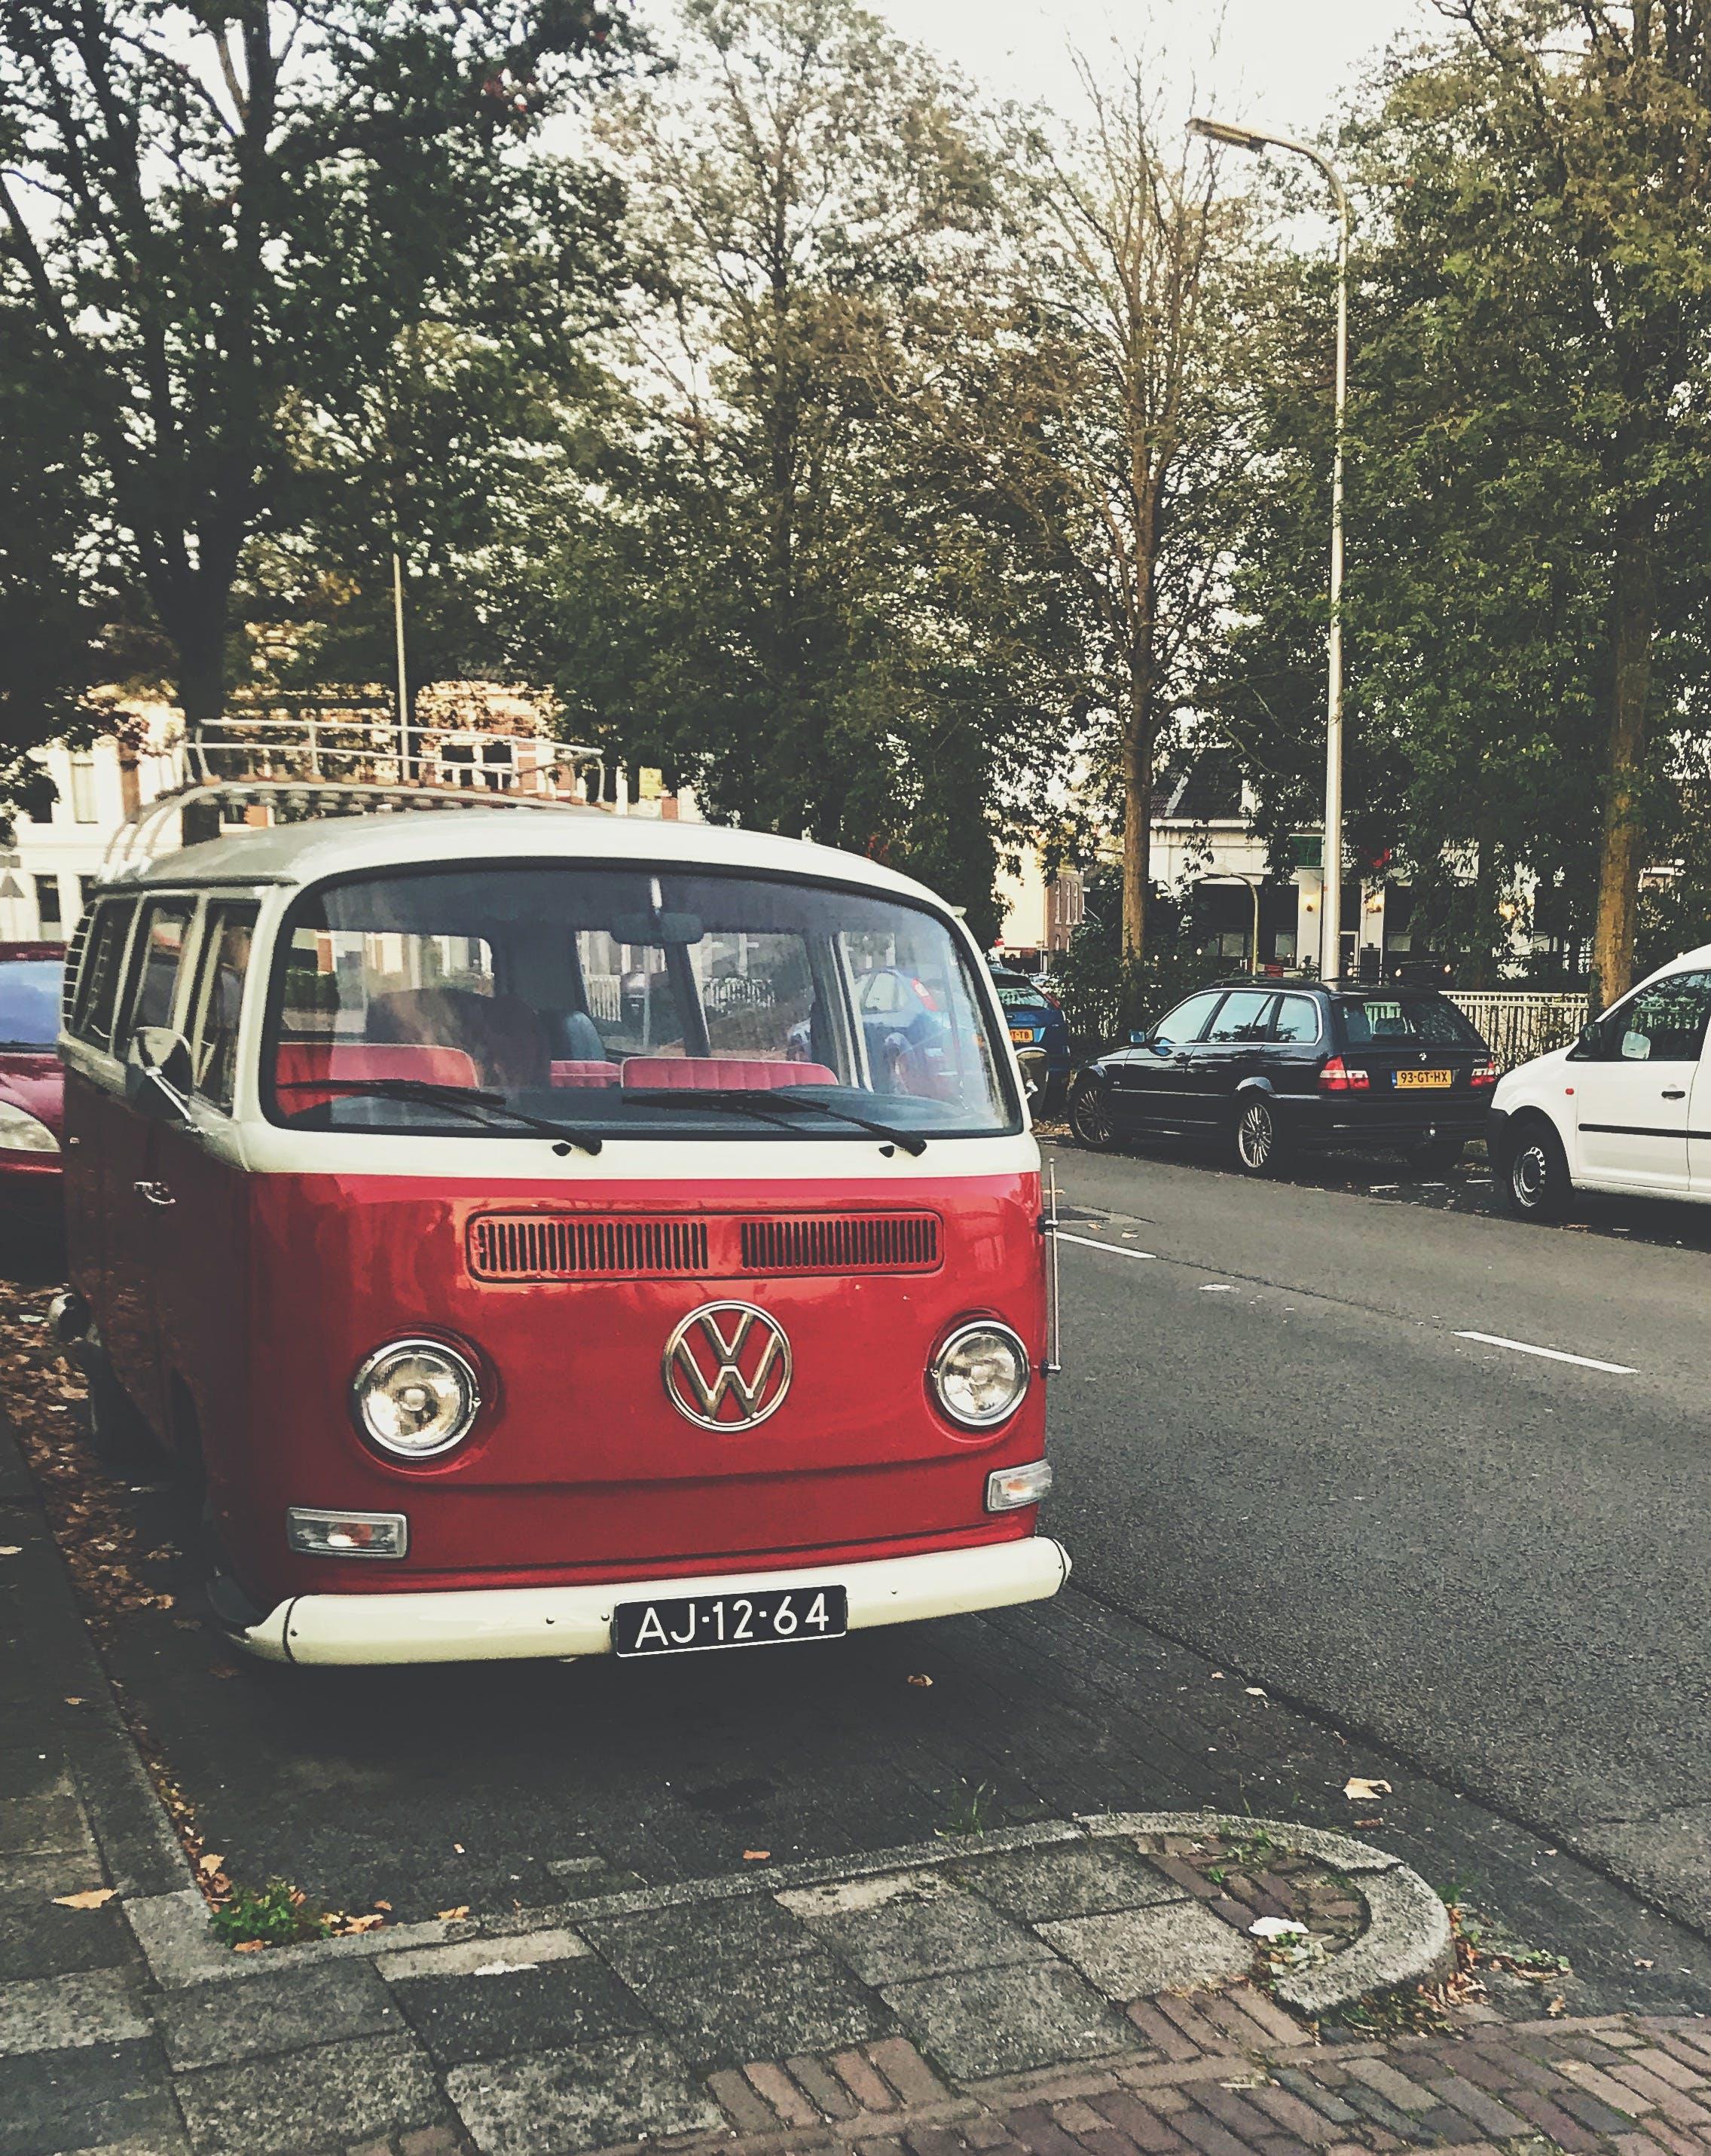 asphalt, automobiles, automotive